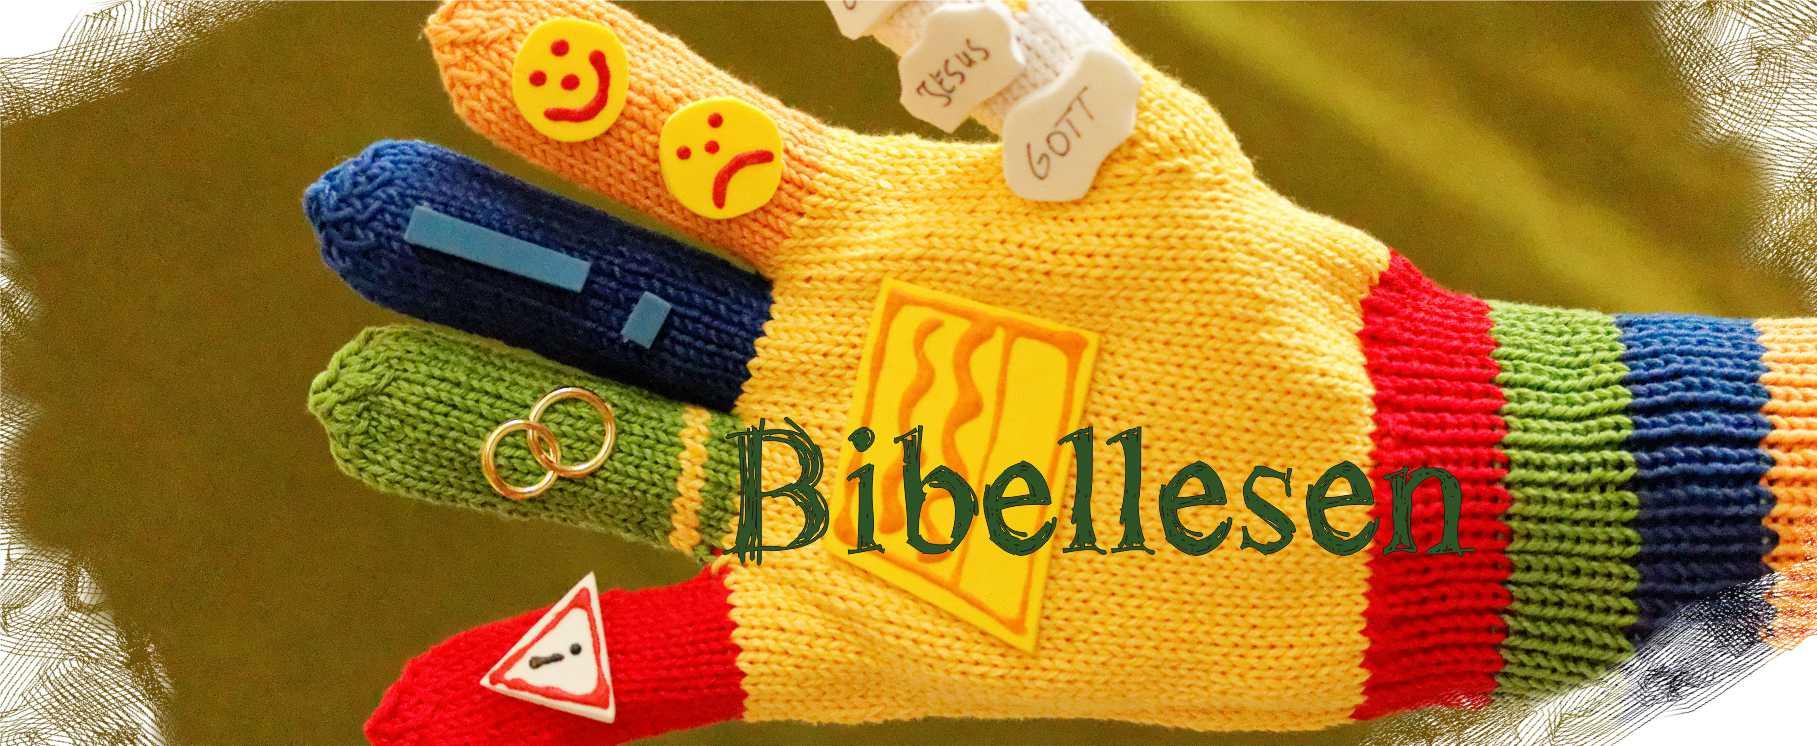 Bibellesen im Kindergottesdienst